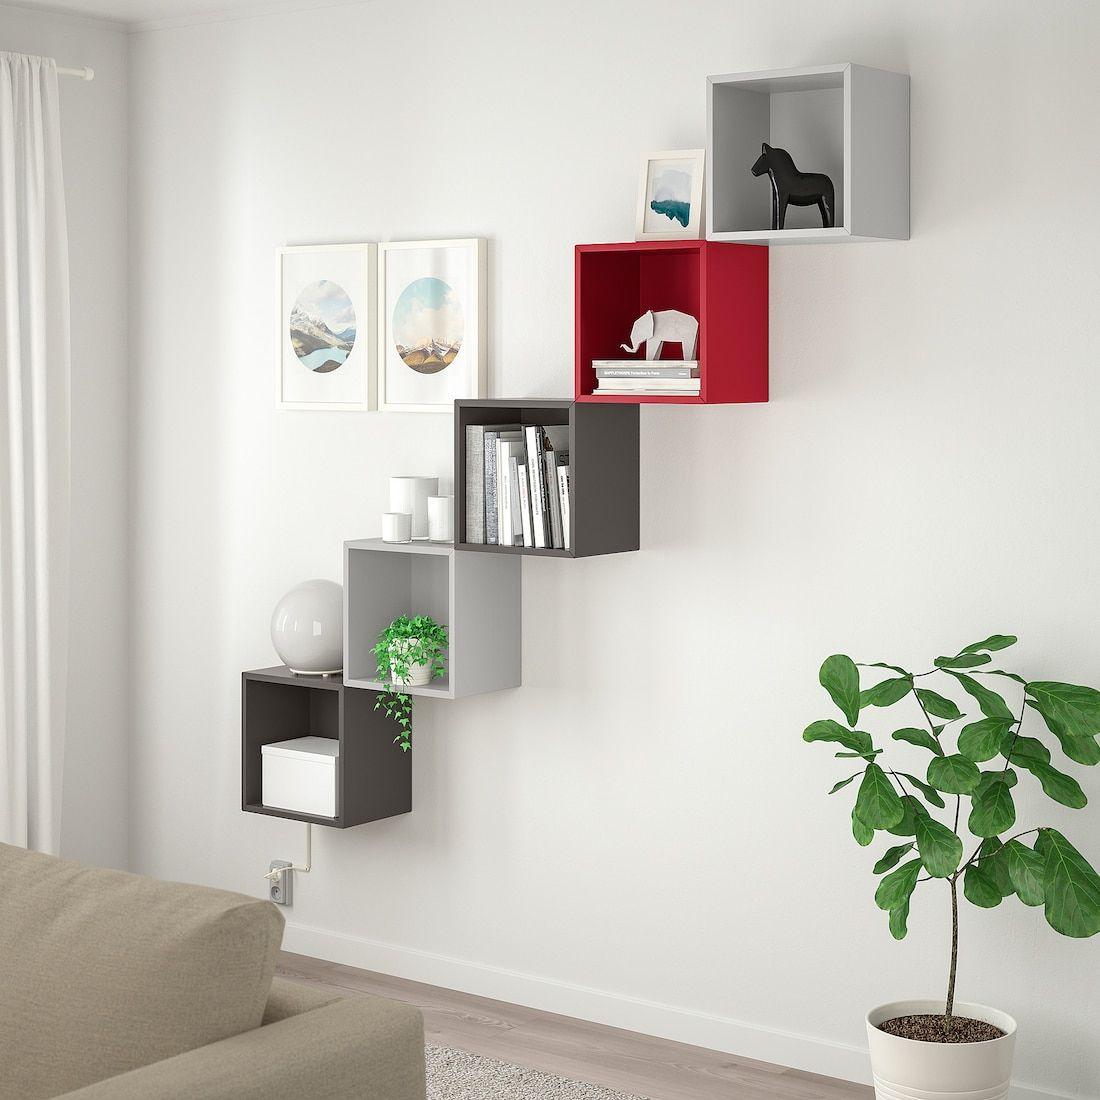 Eket Wall Mounted Storage Combination Light Gray Dark Gray Red Ikea Eket Wall Shelves Design Ikea Eket